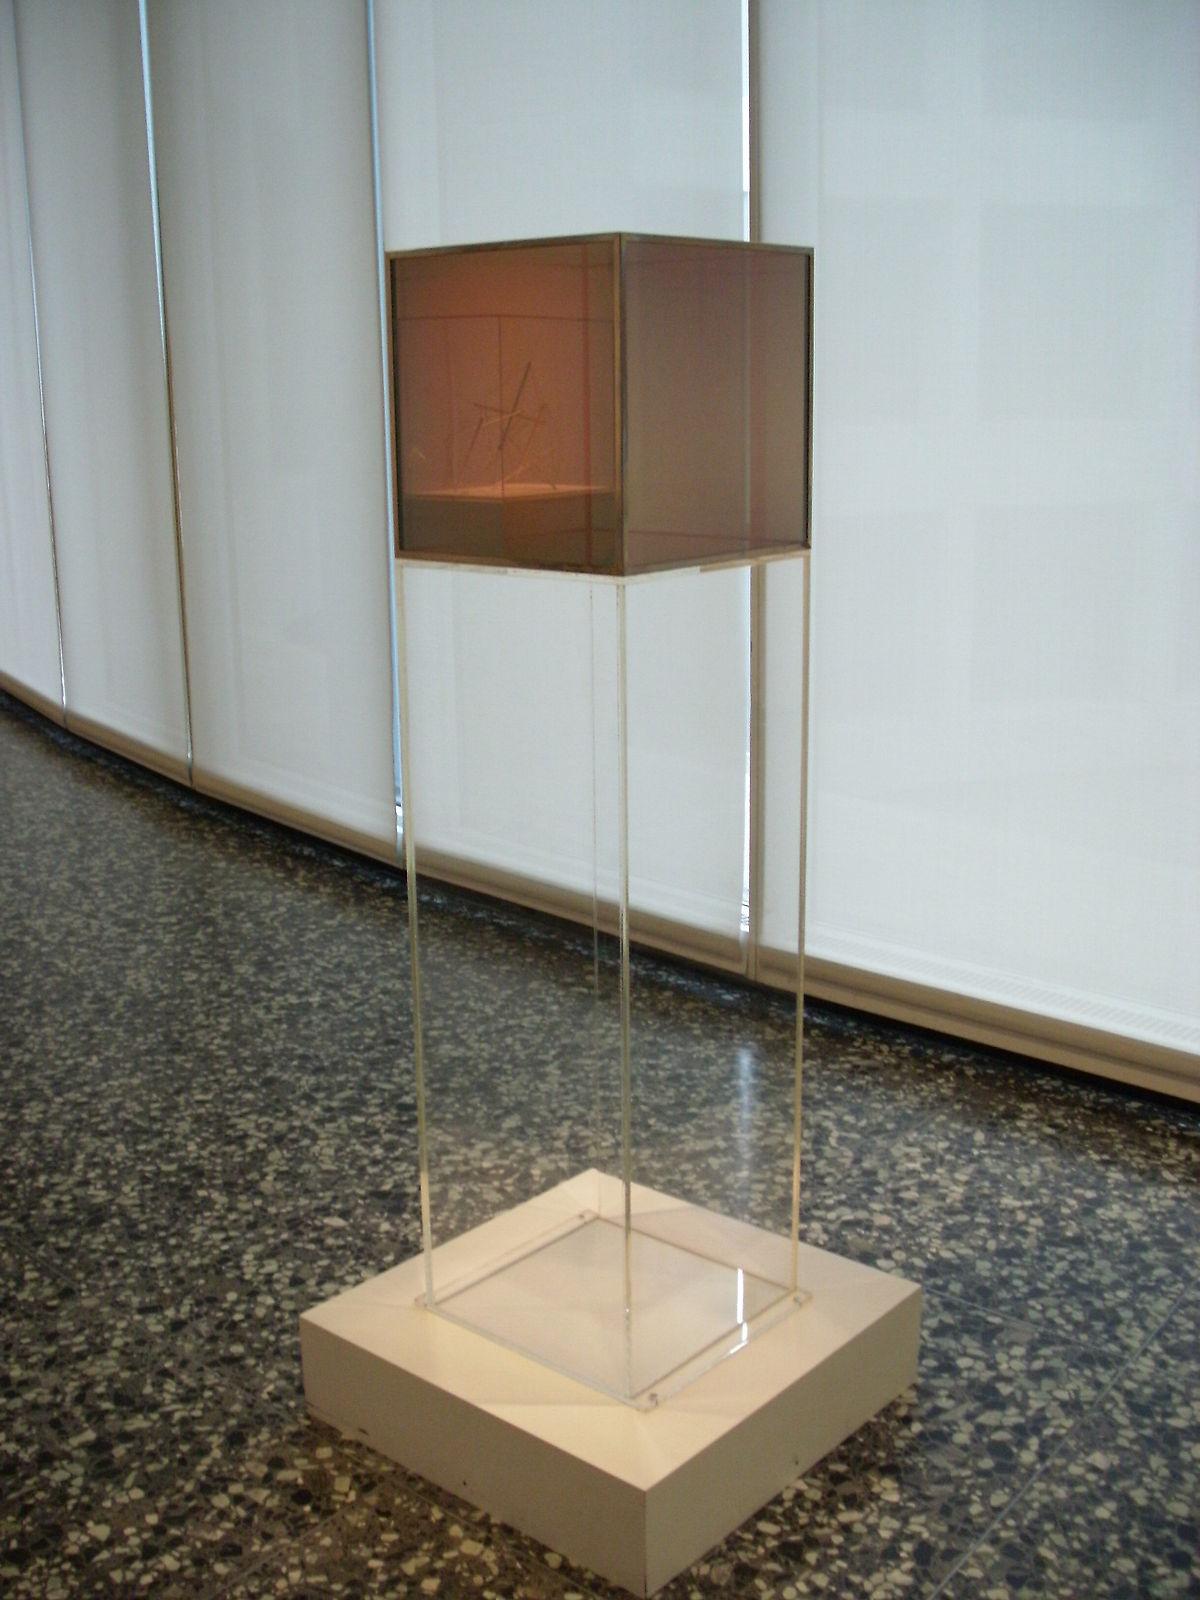 Larry bell artist wikipedia for Minimal art installation